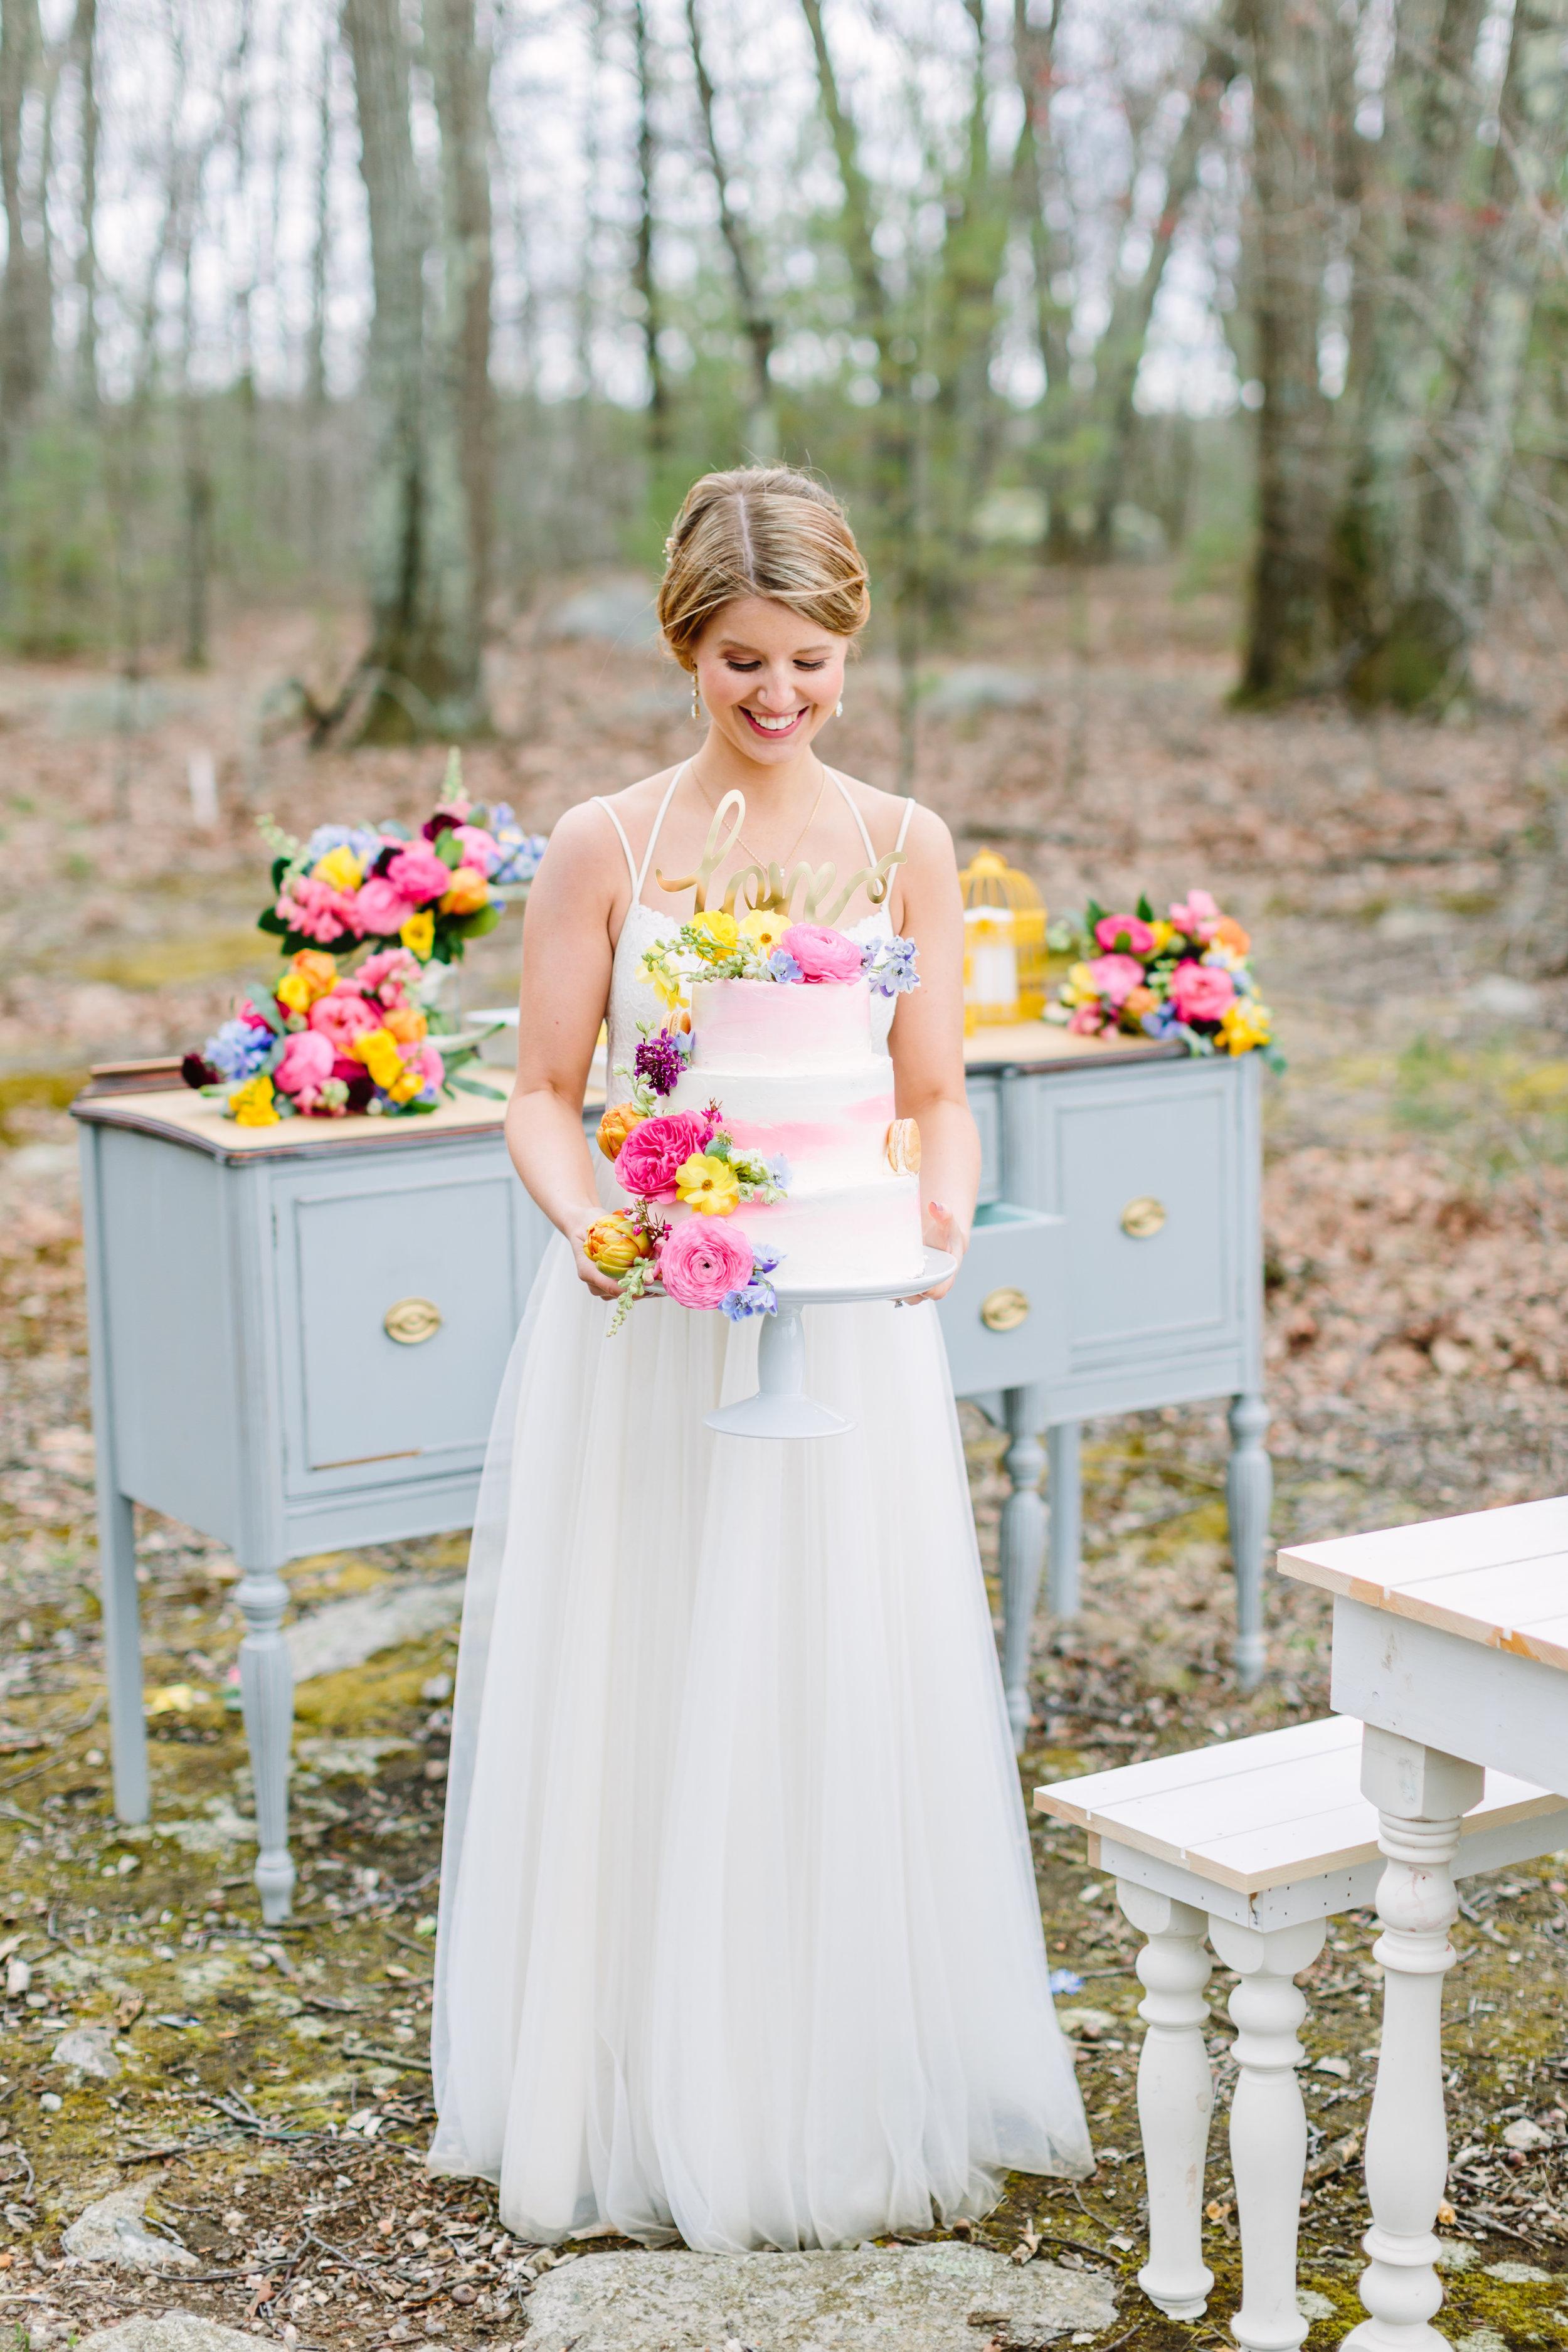 white_and_pink_wedding_cake.jpg